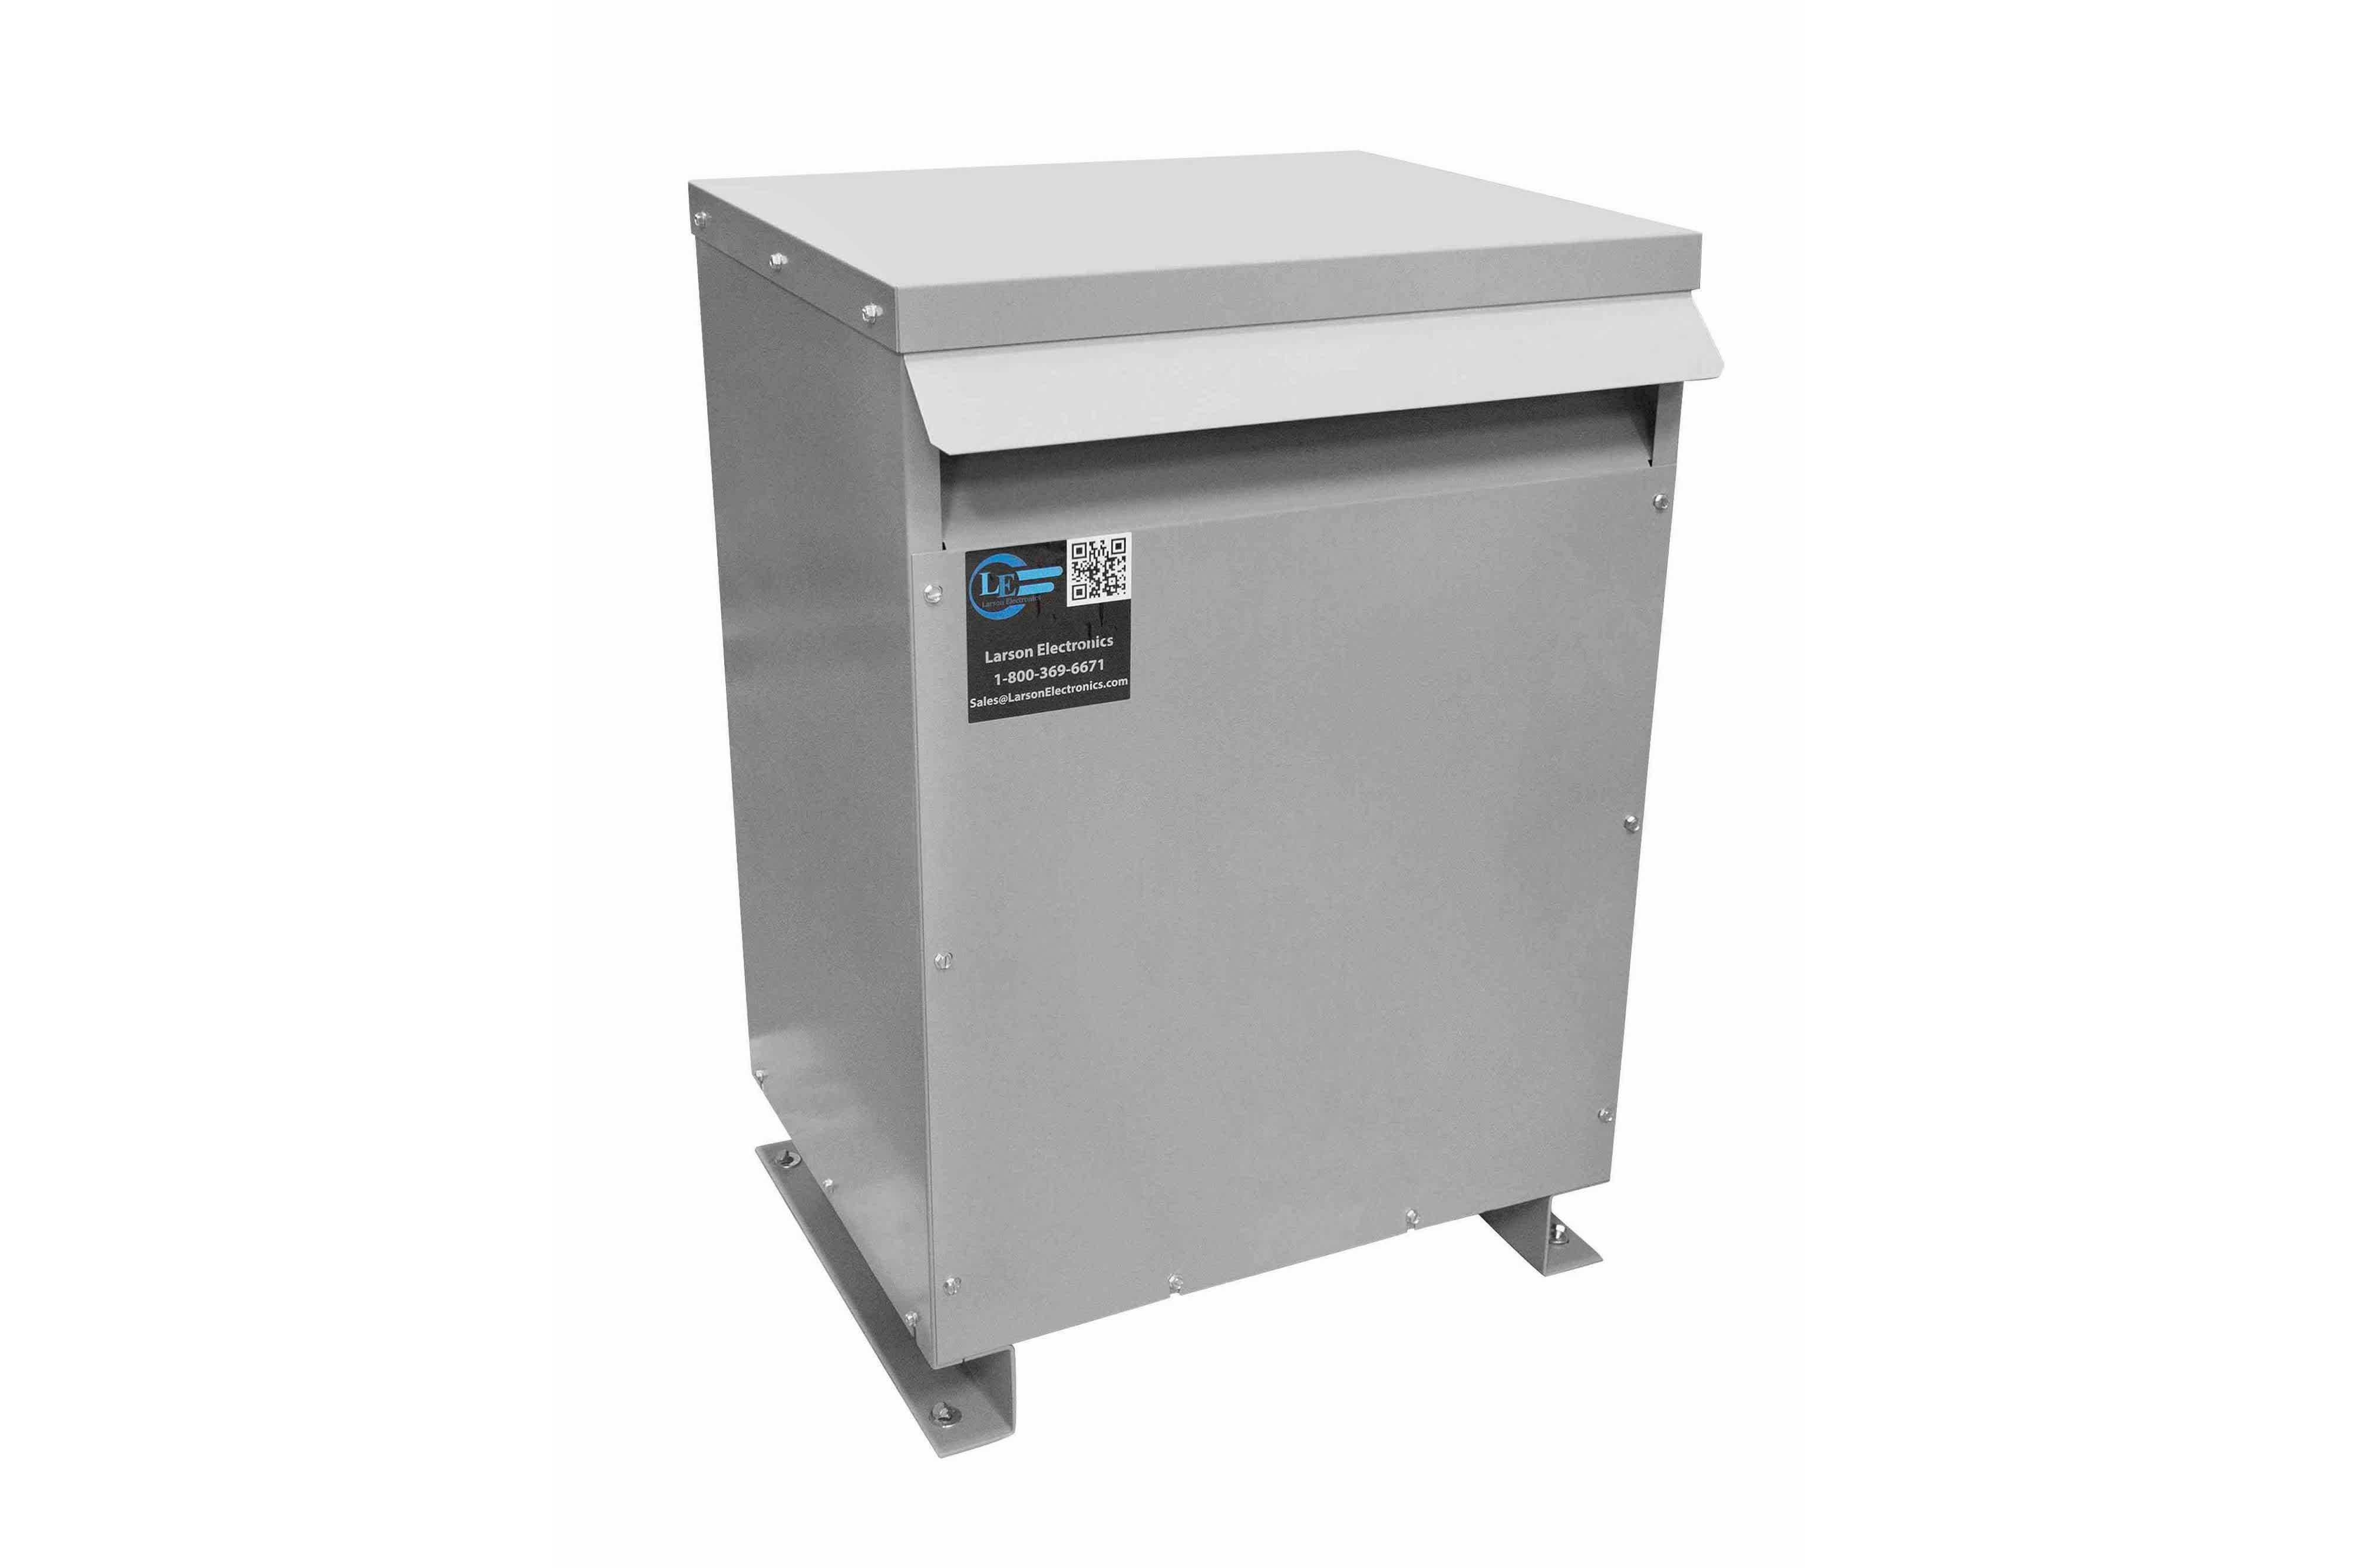 40 kVA 3PH Isolation Transformer, 600V Wye Primary, 240V Delta Secondary, N3R, Ventilated, 60 Hz